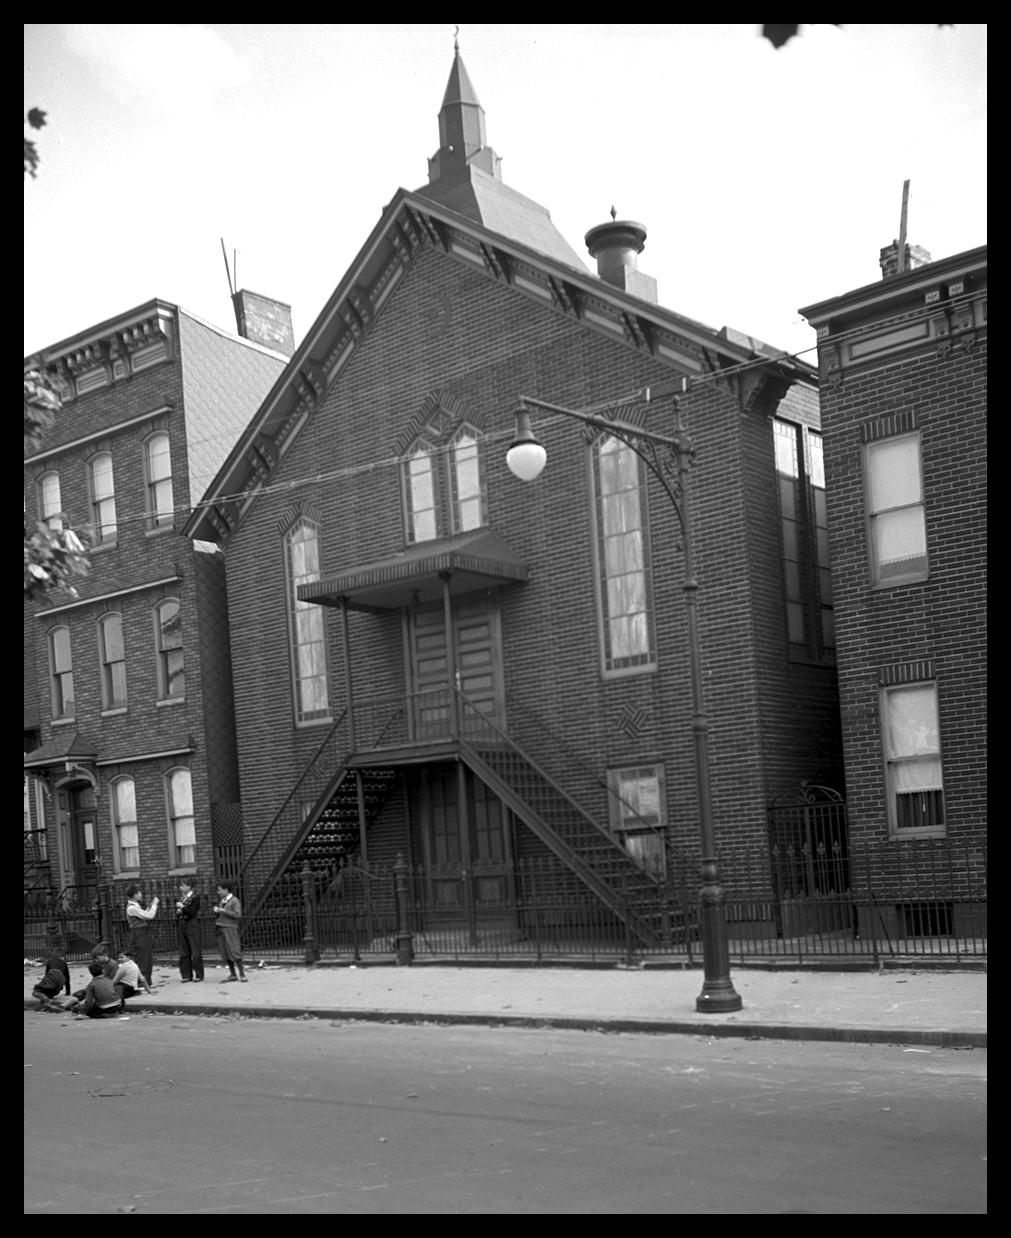 Mosque on Power St, Williamsburg Brooklyn c.1932 from original 4x5 negative